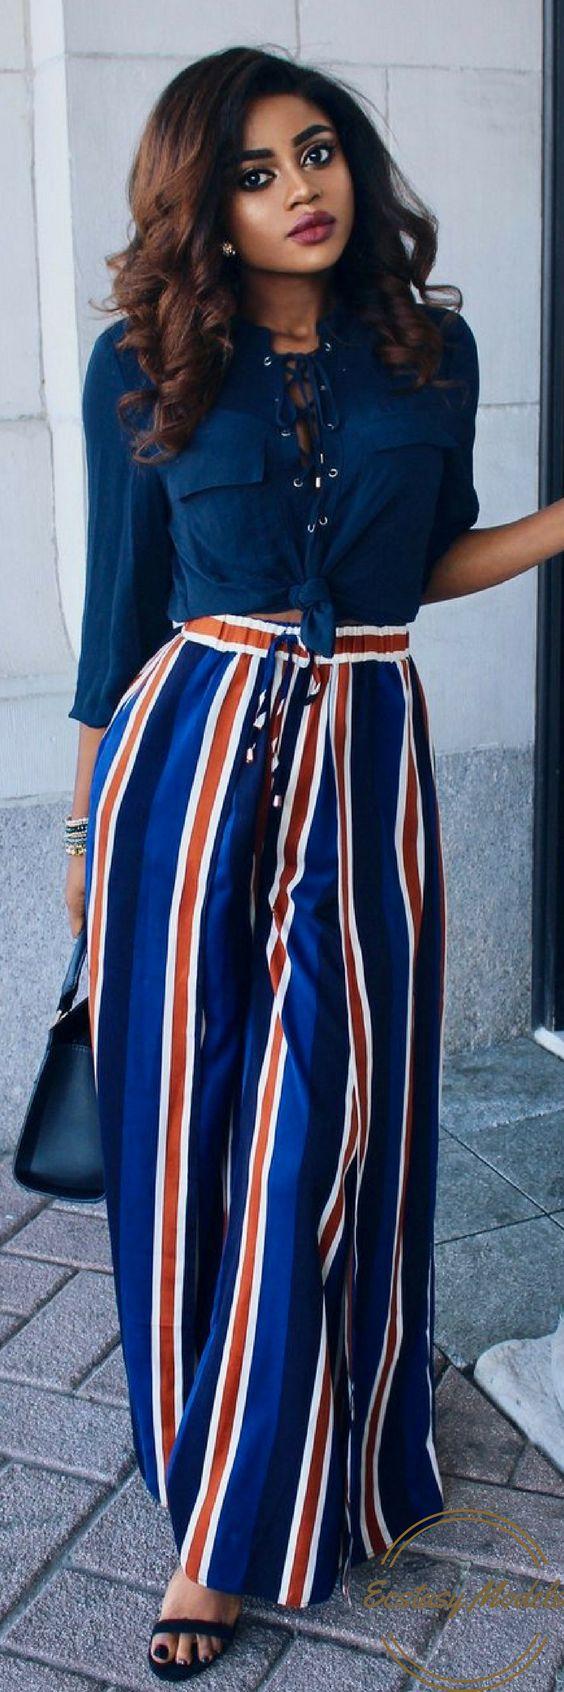 Wide Leg Pants // Fashion Look by Barbra Ray